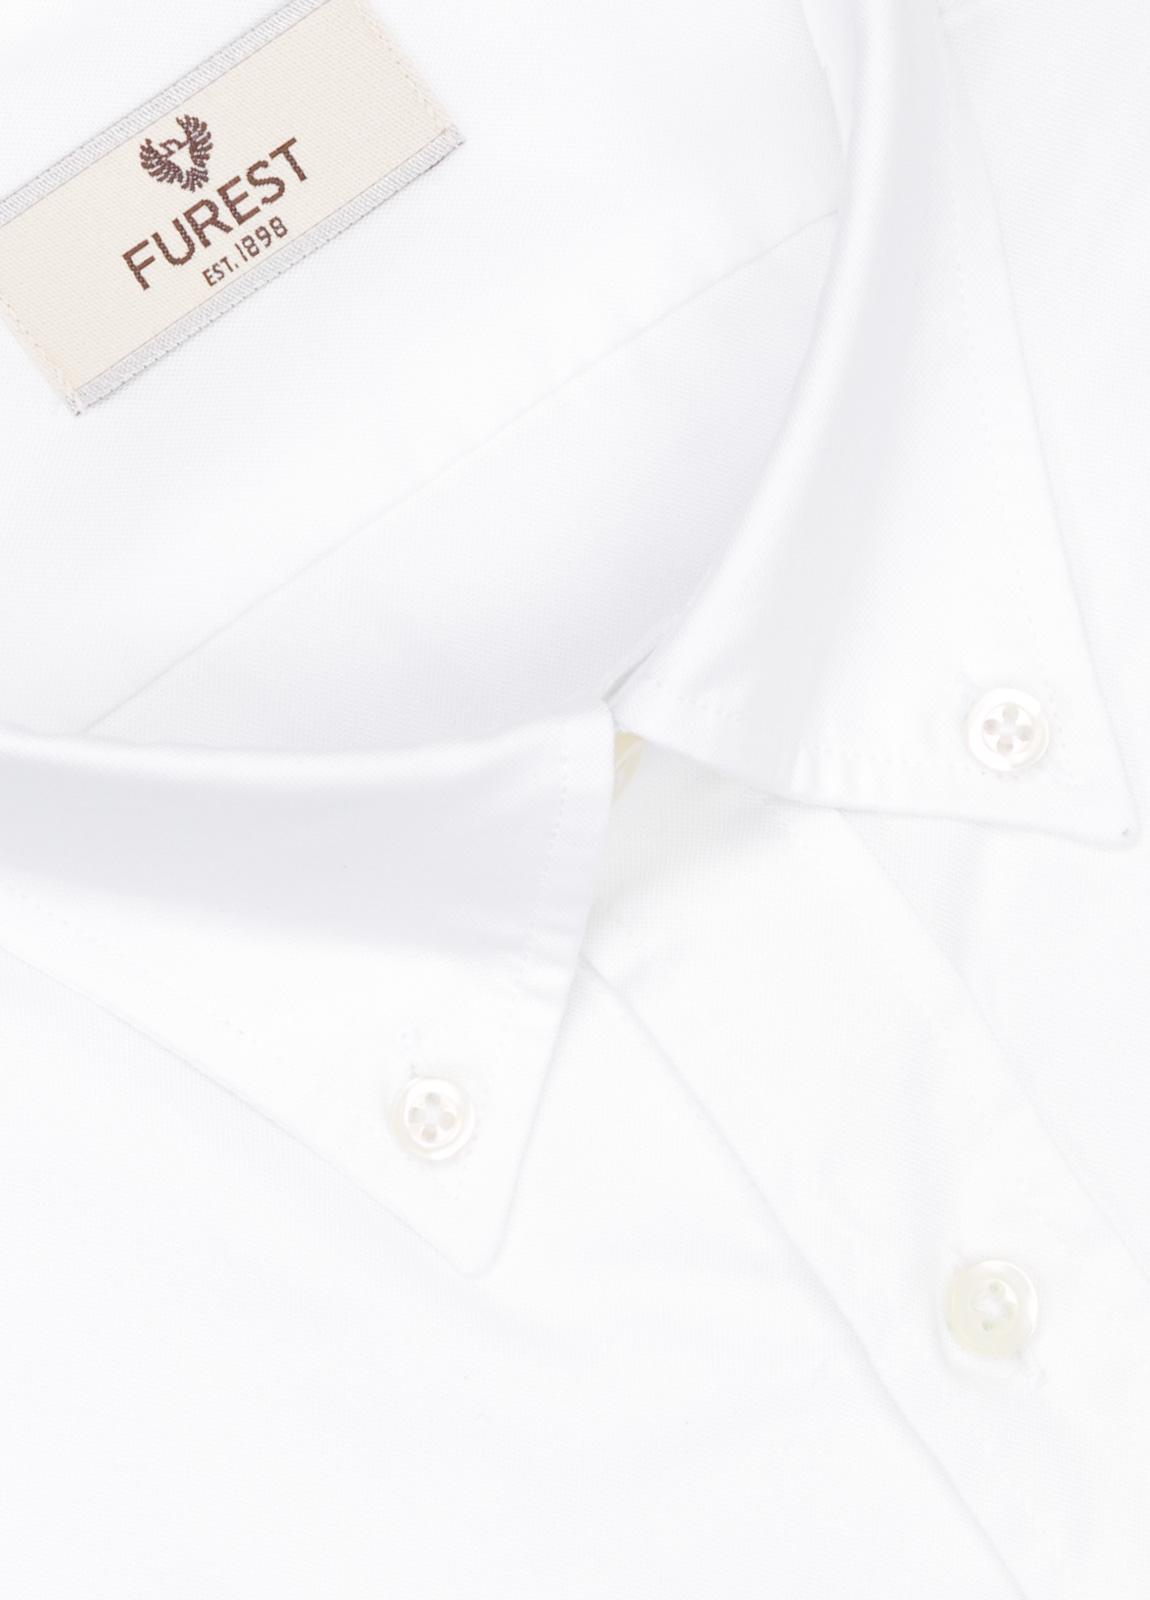 Camisa Leisure Wear REGULAR FIT Modelo BOTTON DOWN color blanco liso , 100% Agodón. - Ítem1